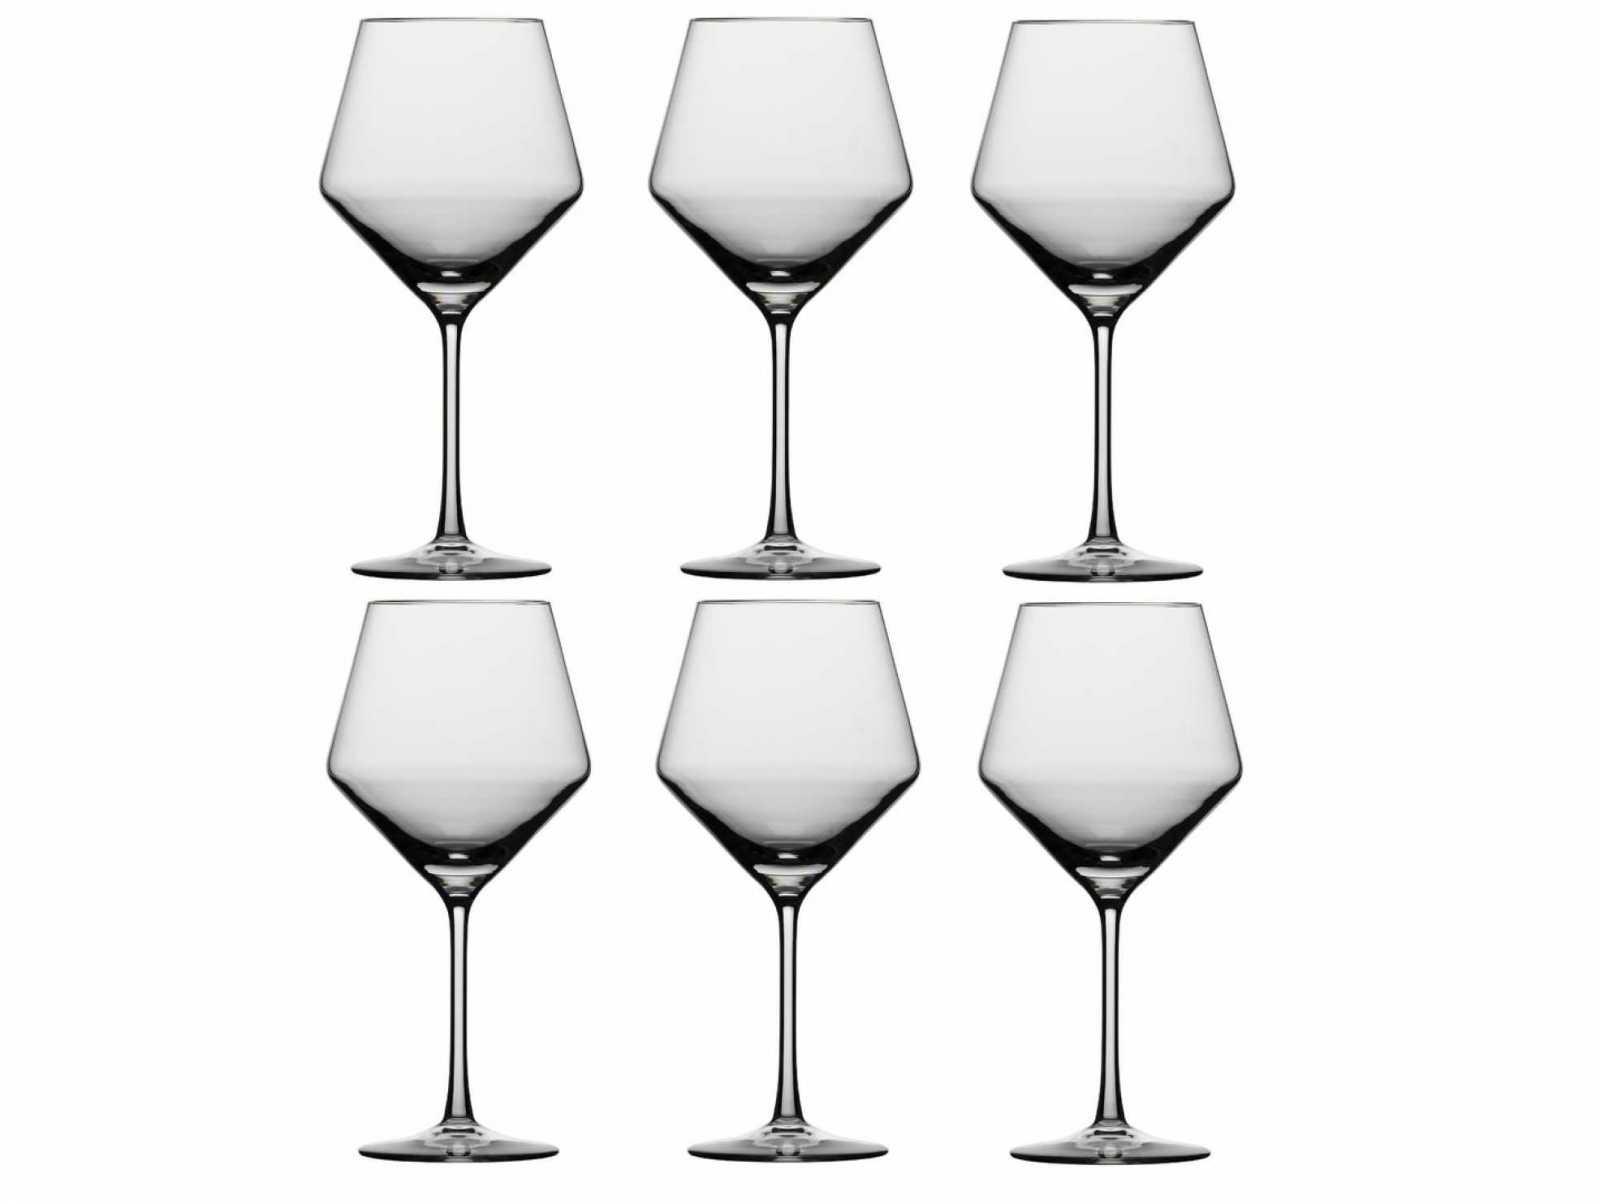 Набор бокал для красного вина Schott Zwiesel PURE, объем 0,692 л, прозрачный, 6 штук Schott Zwiesel 112421_6шт фото 0